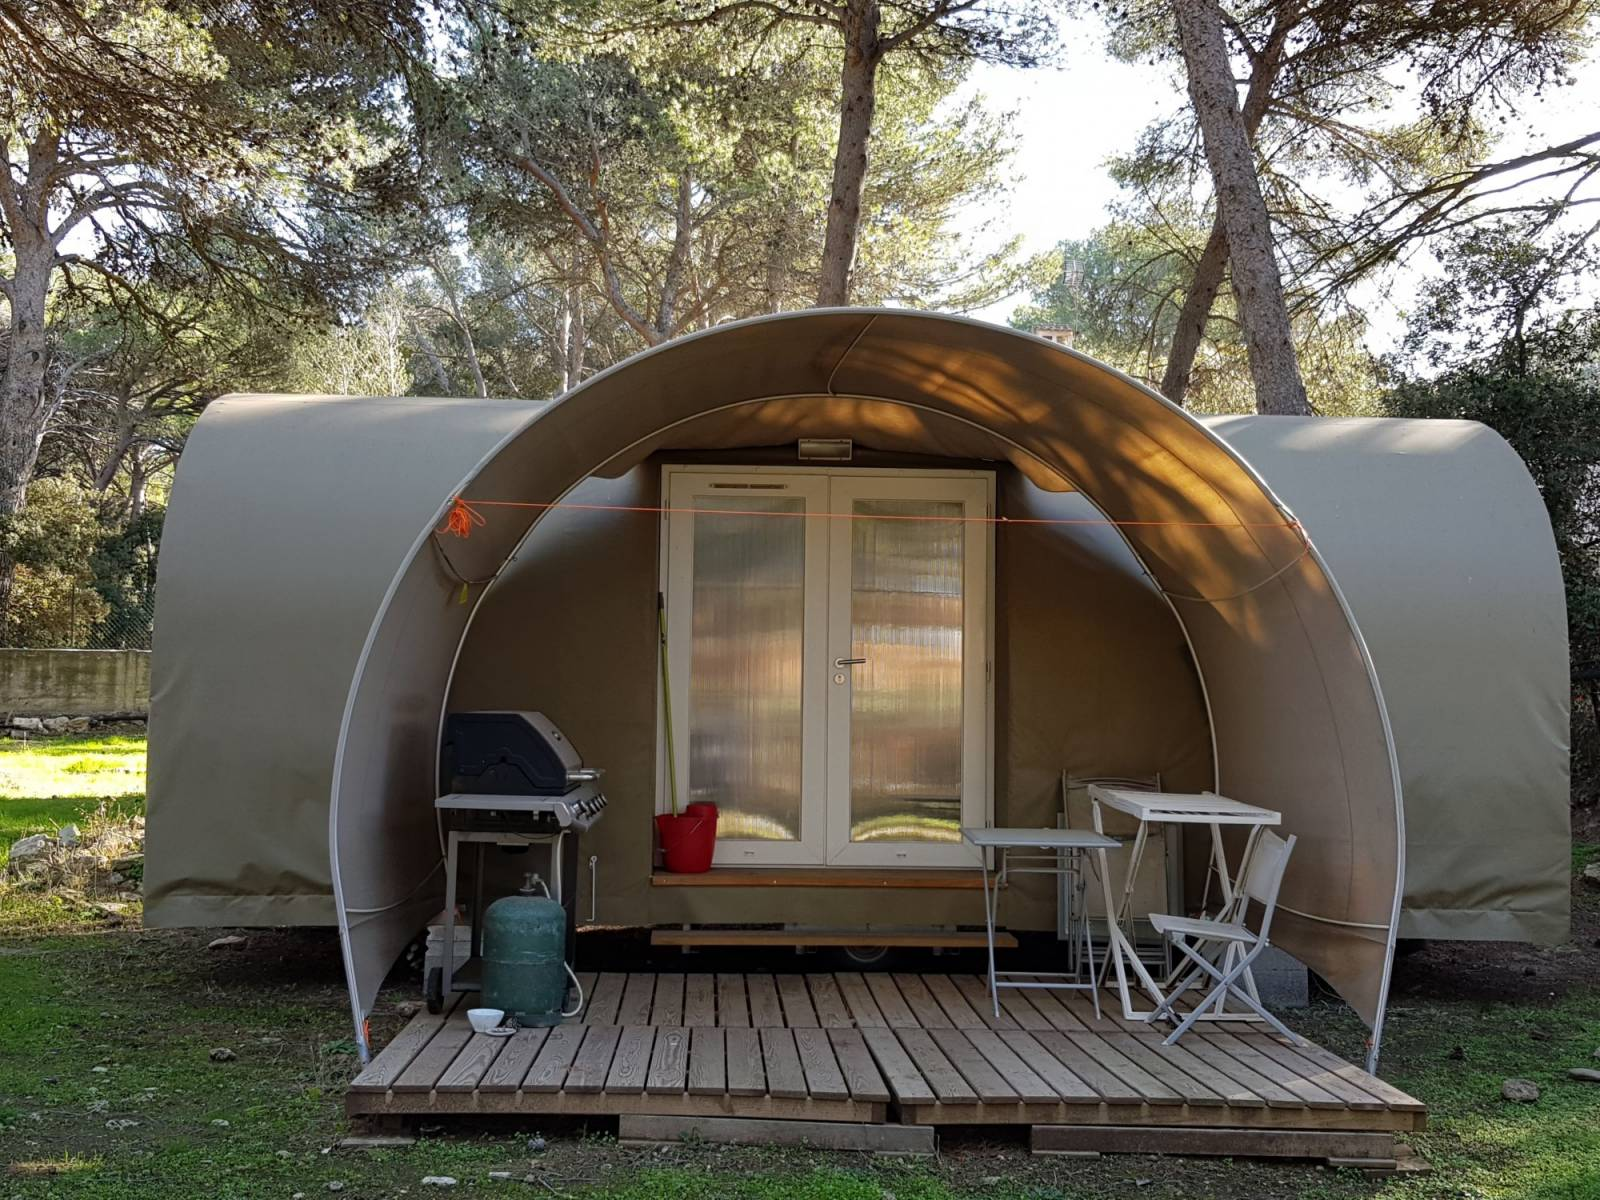 Camping 3 toiles avec piscine en provence camping la pin de - Camping dans le vercors avec piscine ...